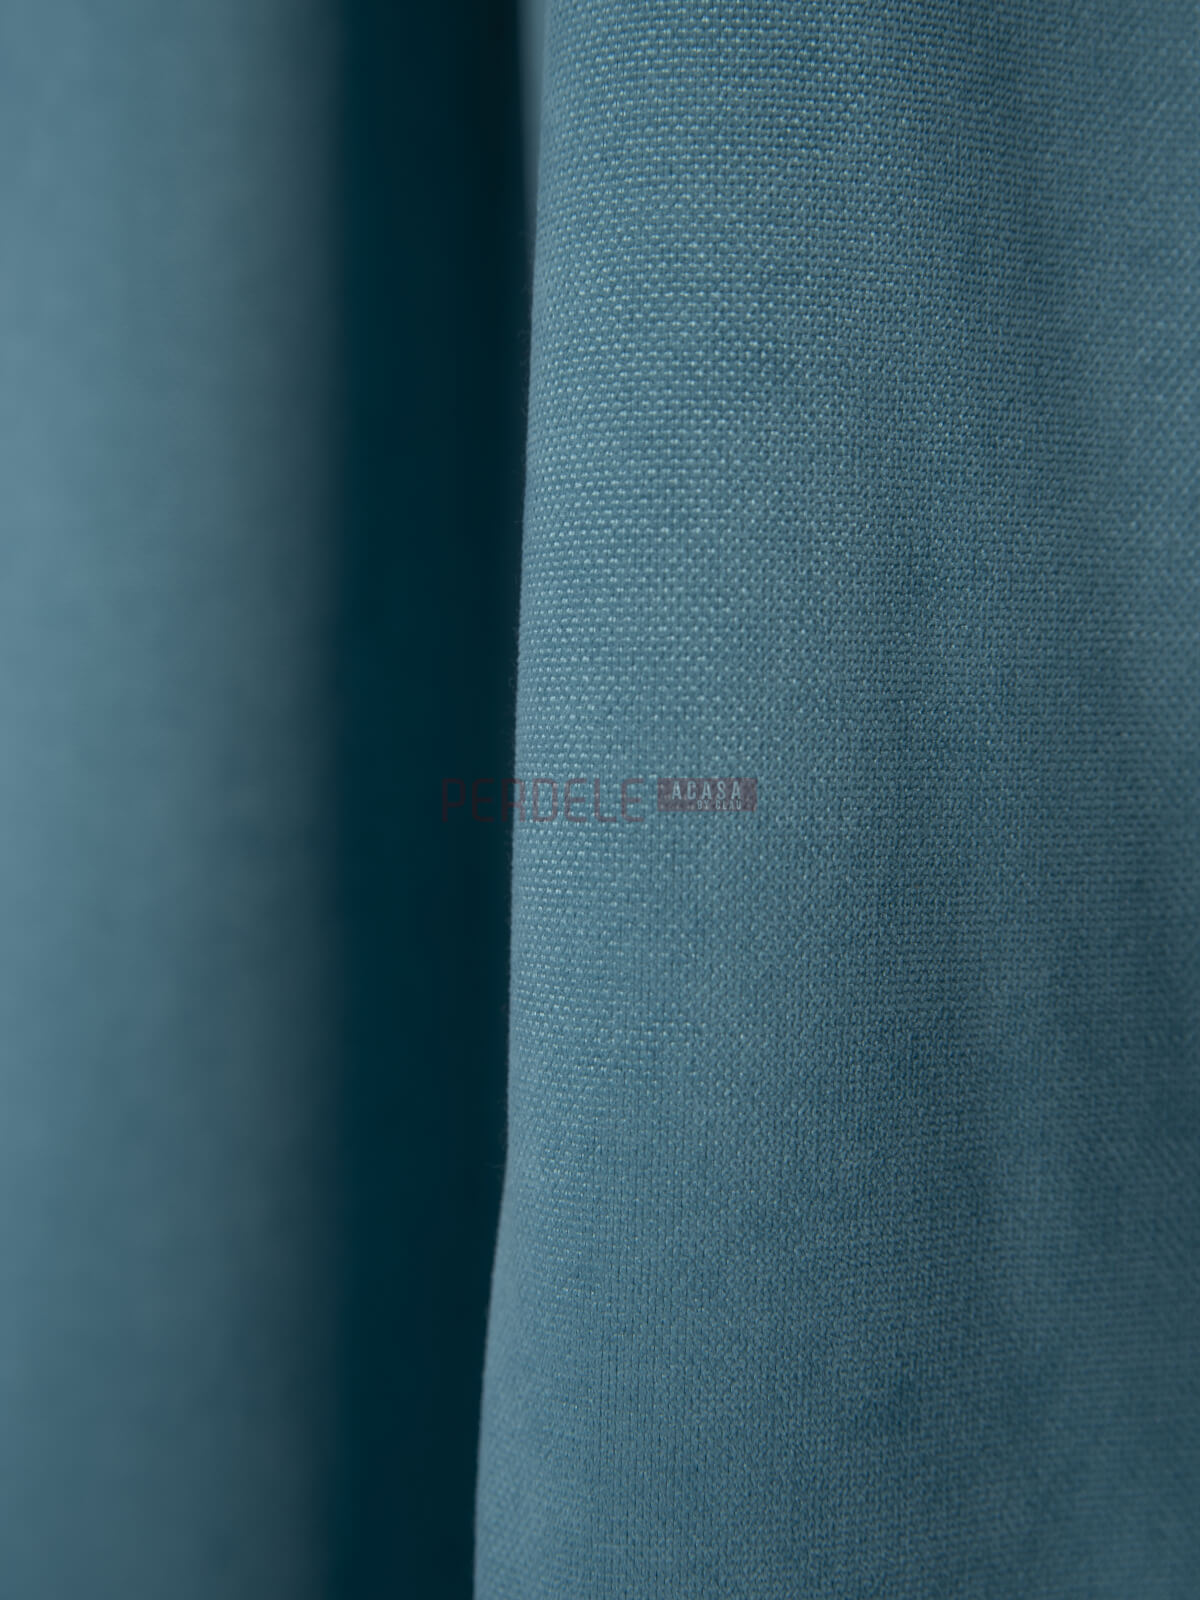 Draperie Petec, bleu